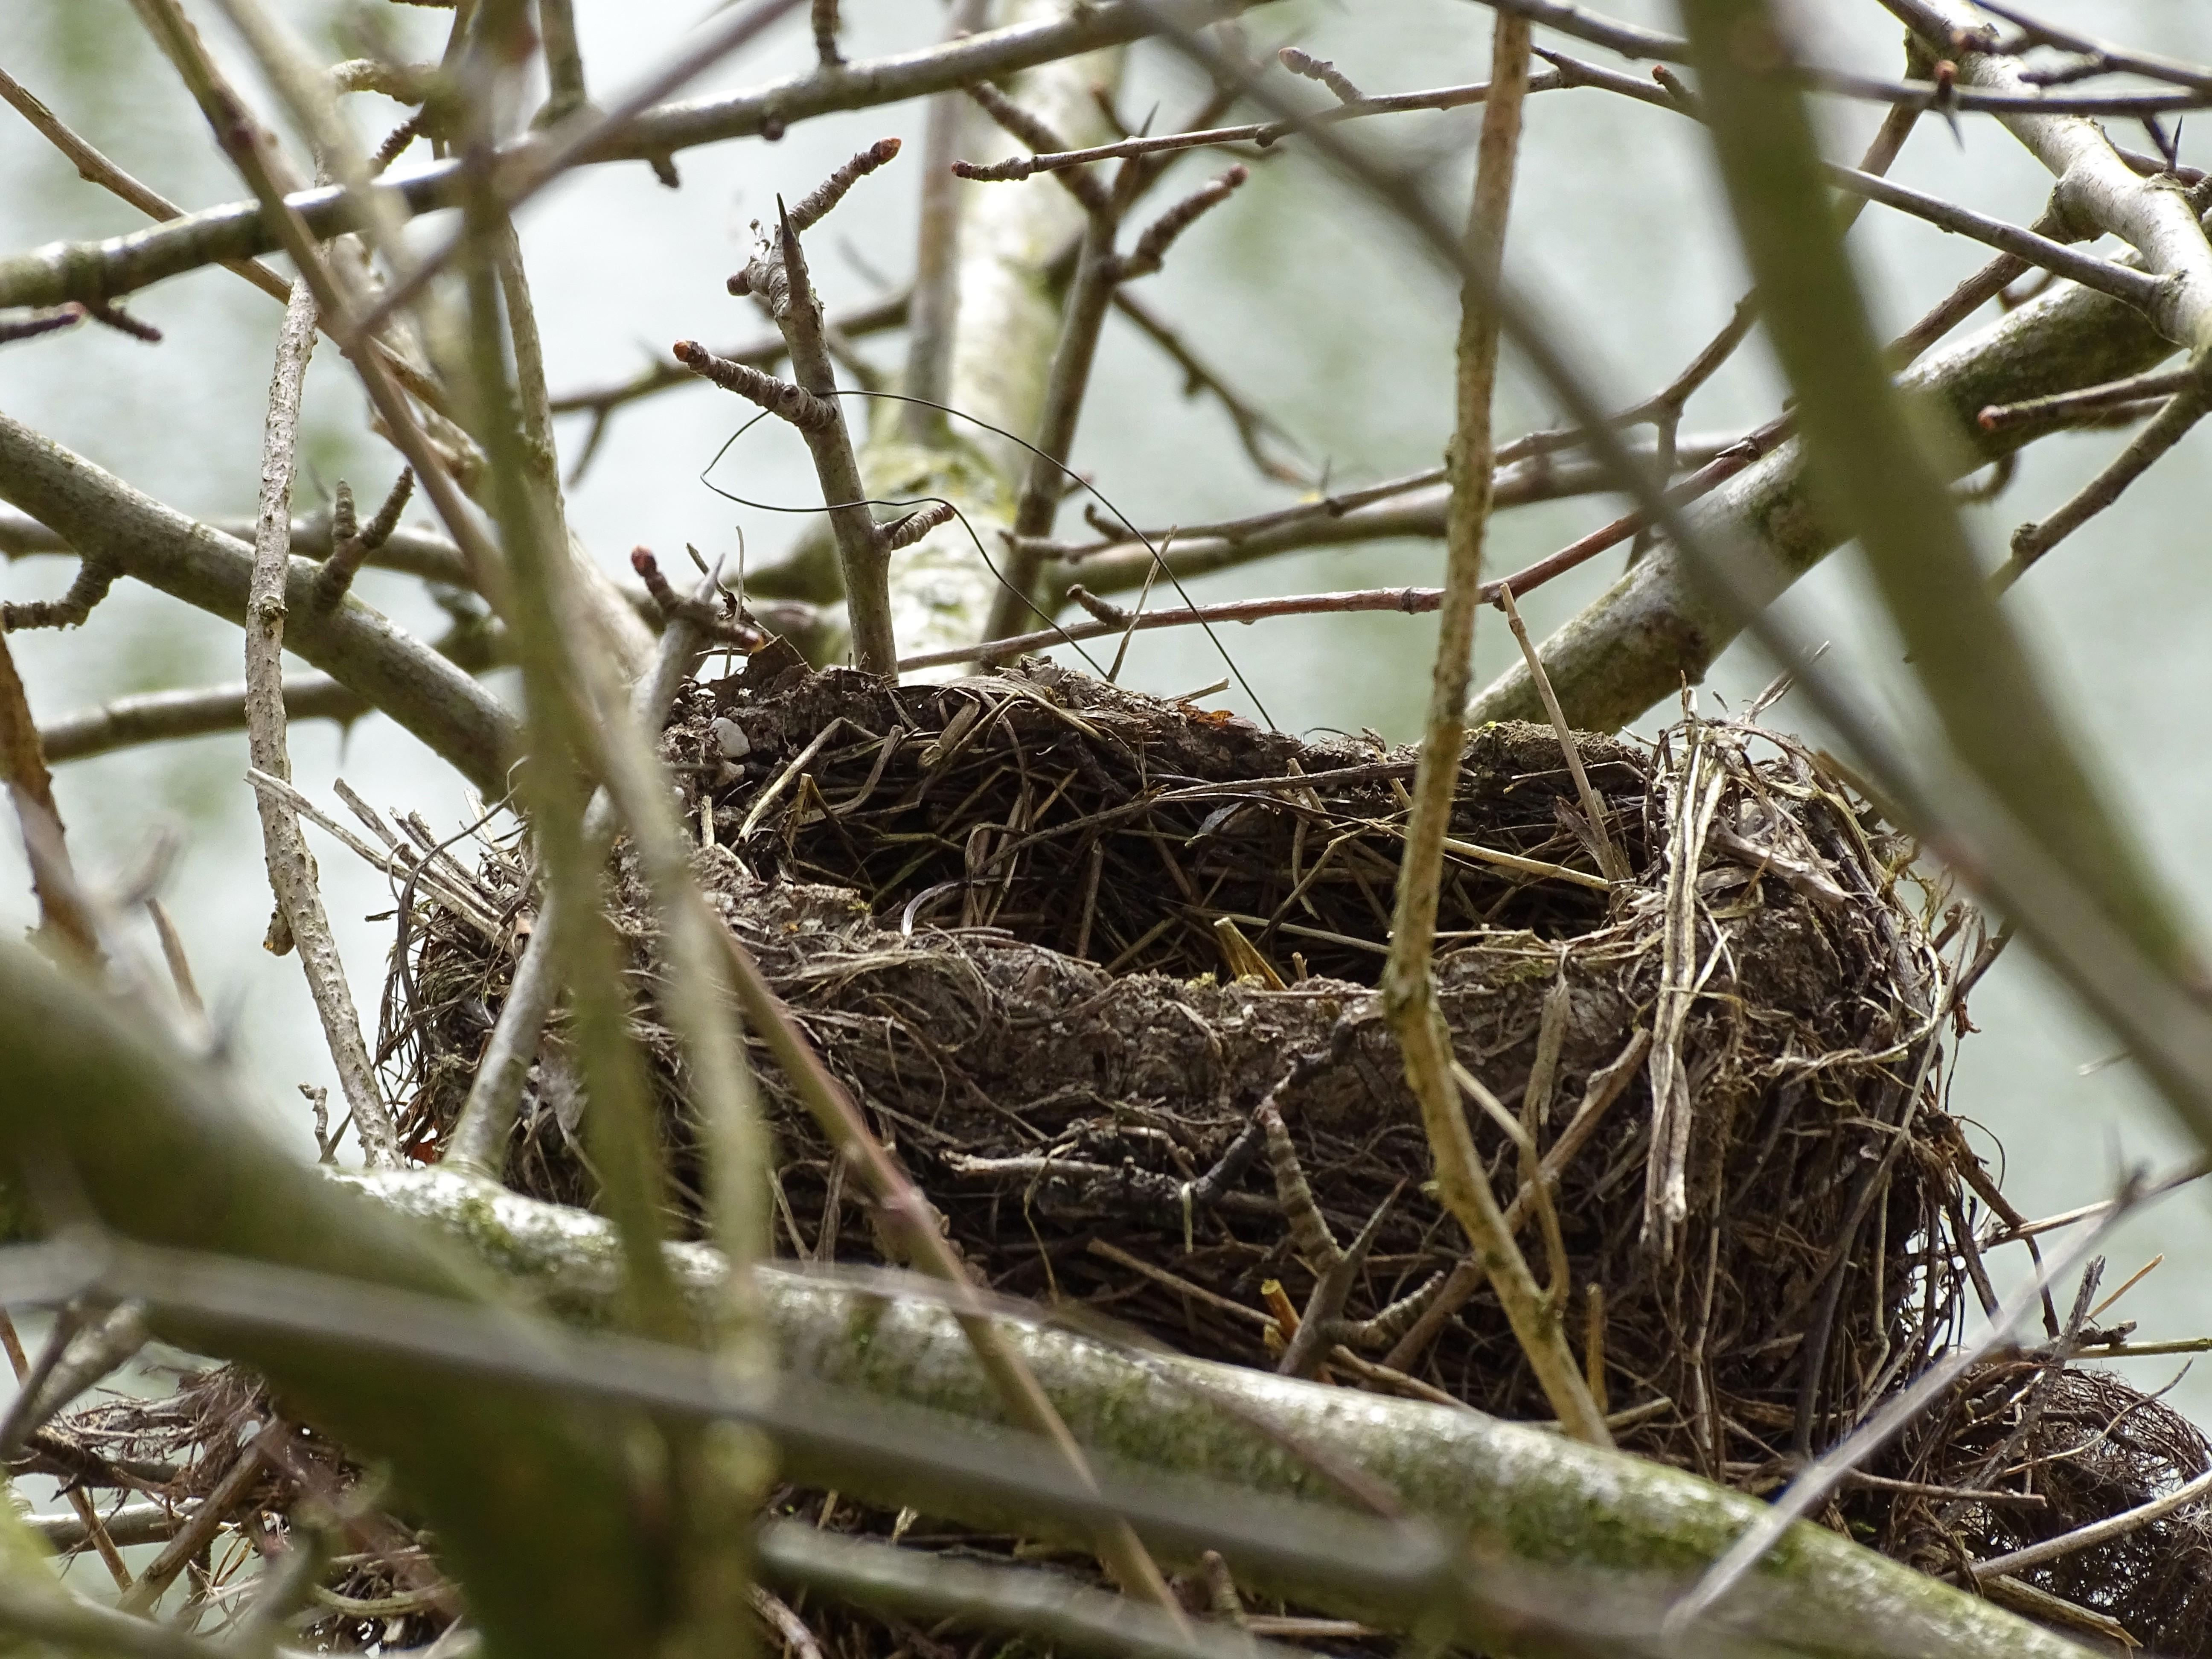 4-Nest-Kurpark-Bad-Birnbach-Foto-Nadia-Baumbach